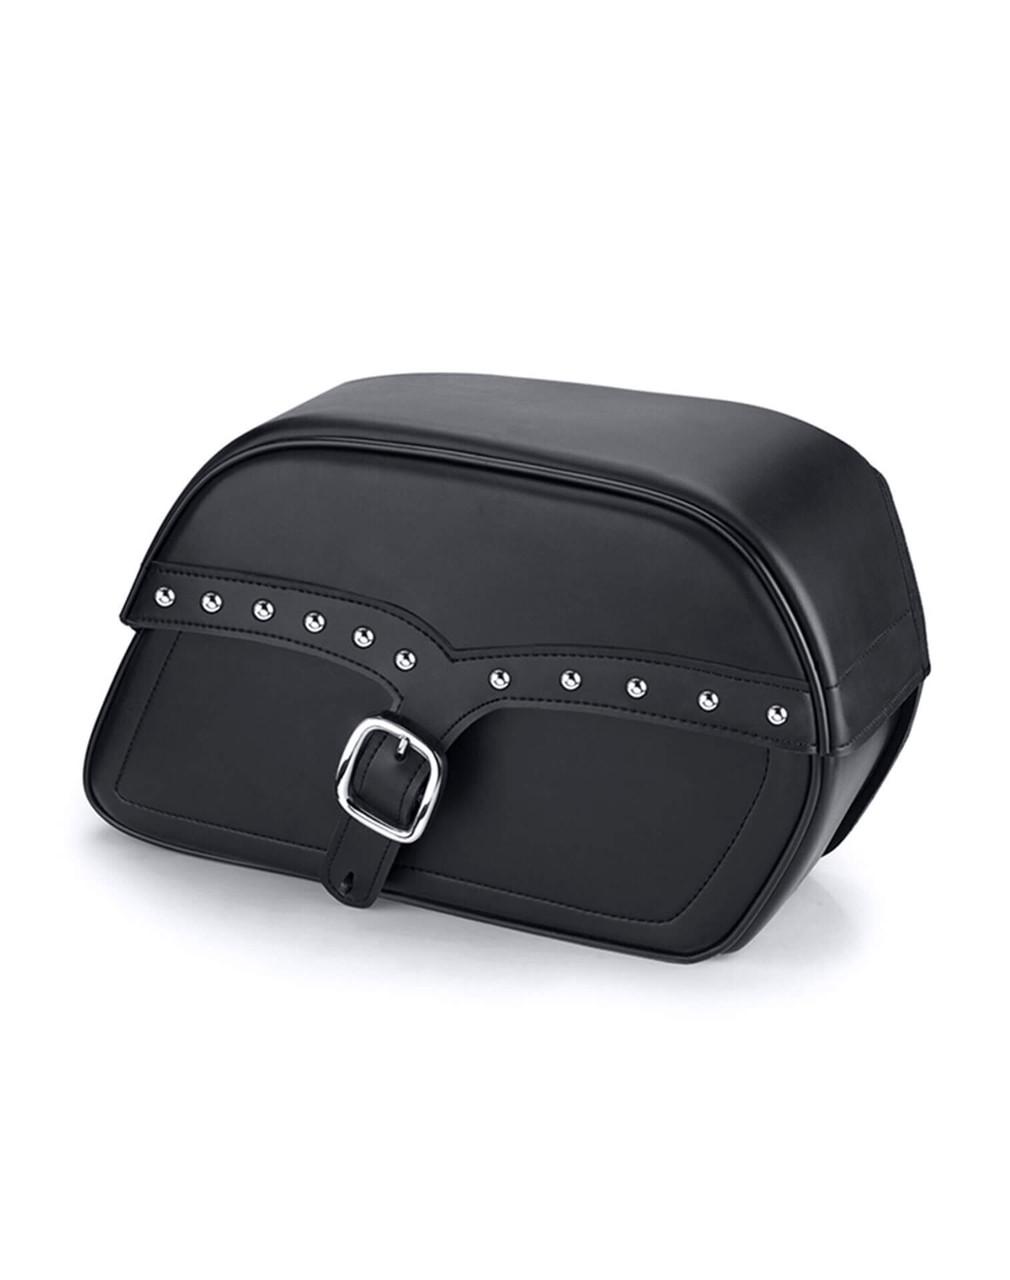 Honda 1100 Shadow Aero SS Slanted Studd Medium Motorcycle Saddlebags Main Bag View